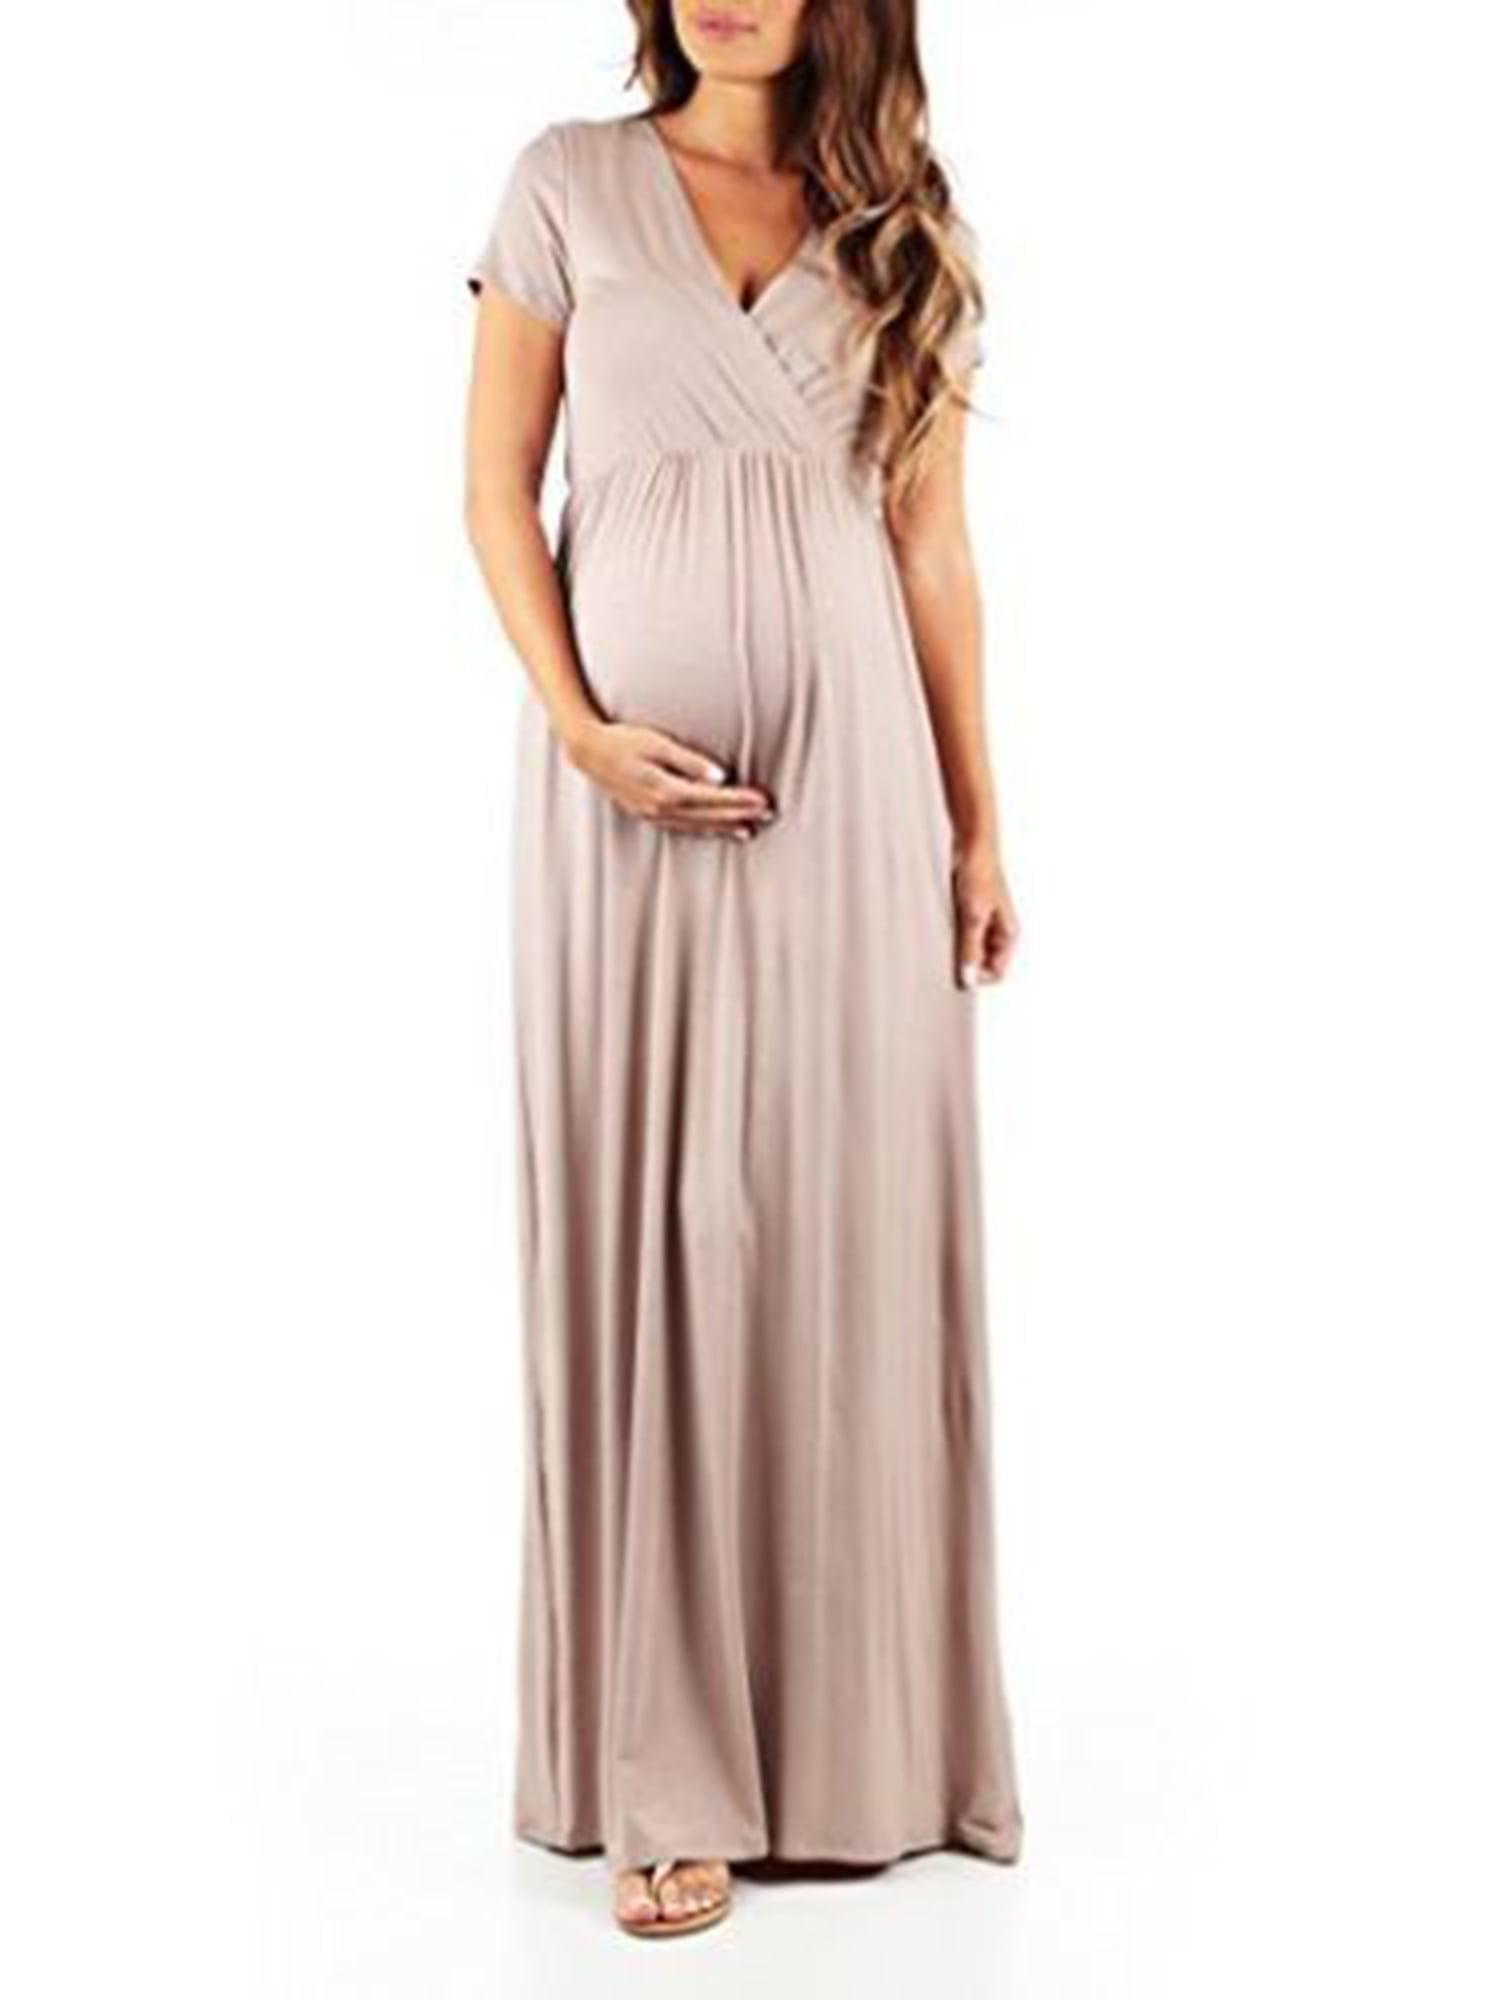 Sexy Dance Maternity Maxi Dress Pregnant Women Long Gown Wrap Photography Photo Shoot Props V Neck Casual Loose Pregnancy Dresses Walmart Com Walmart Com